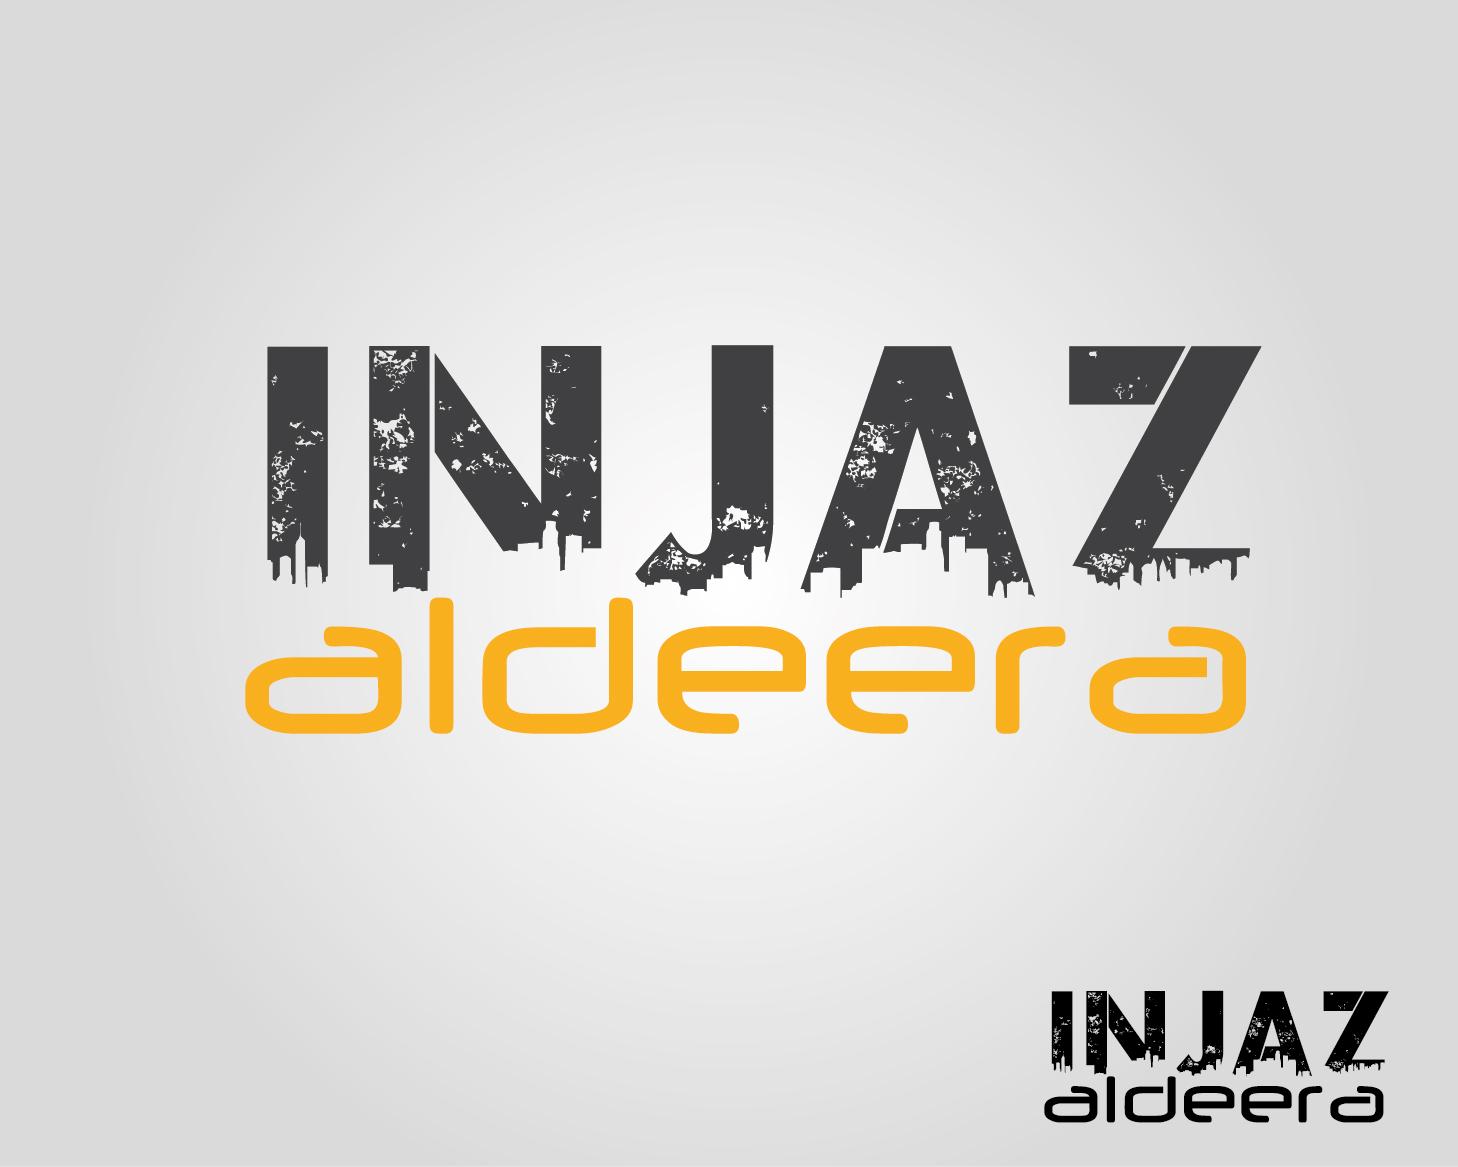 Logo Design by VENTSISLAV KOVACHEV - Entry No. 44 in the Logo Design Contest Fun Logo Design for Injaz aldeera.